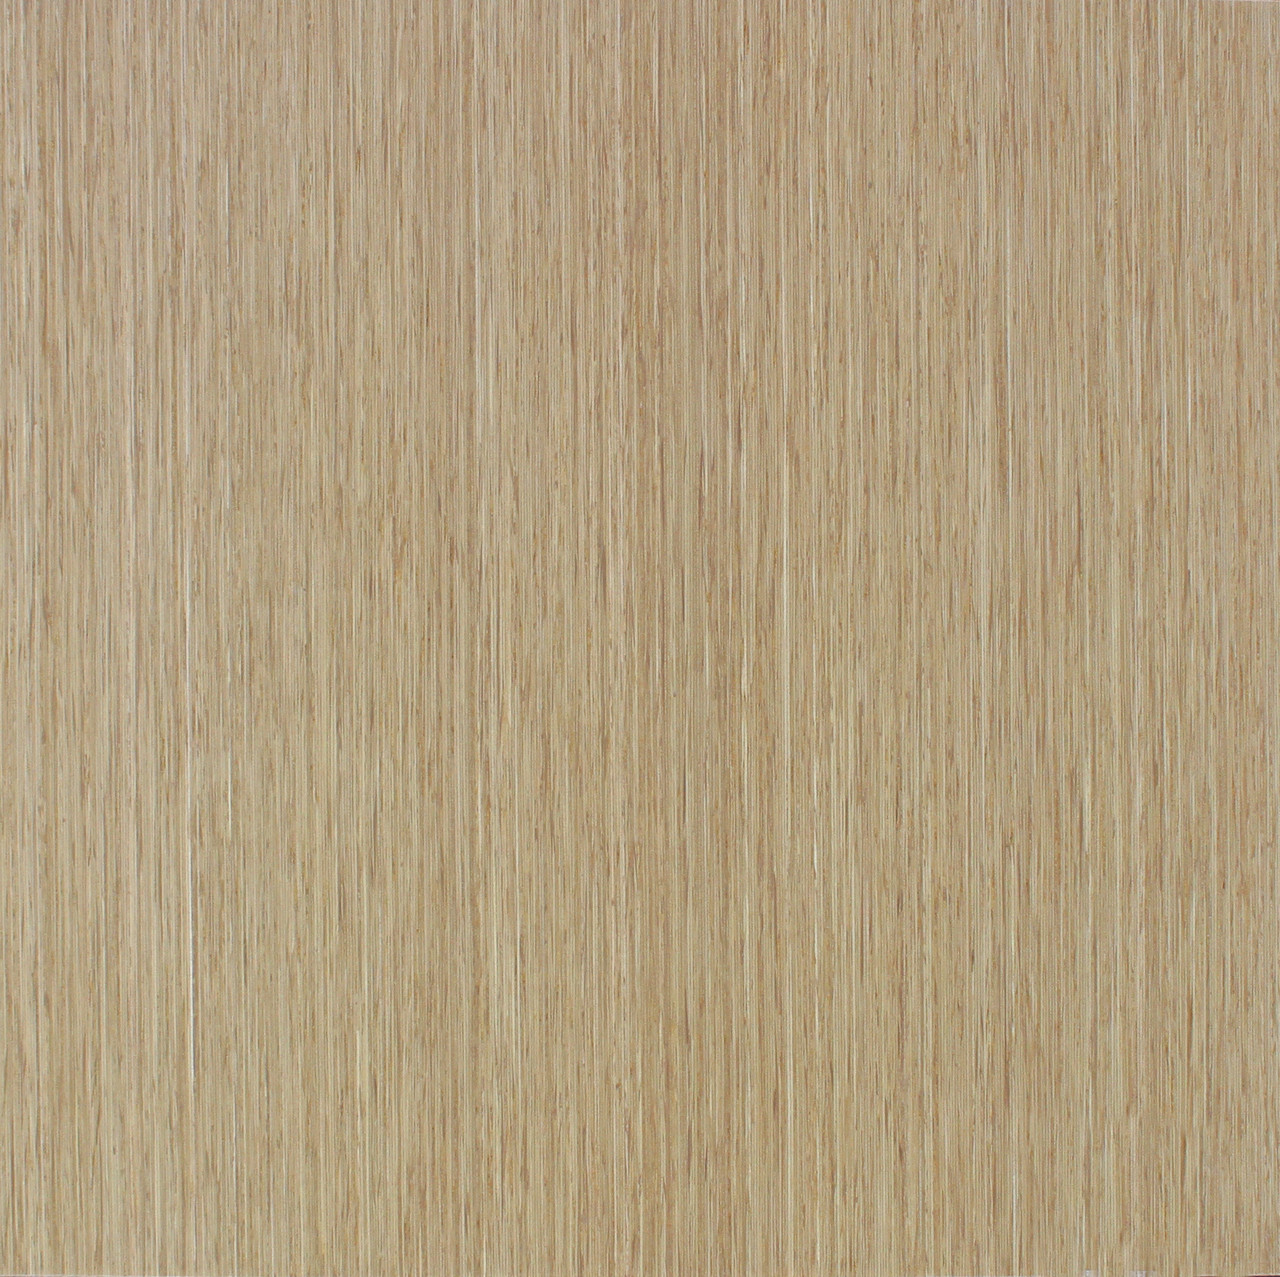 Plain White Laminate Texture